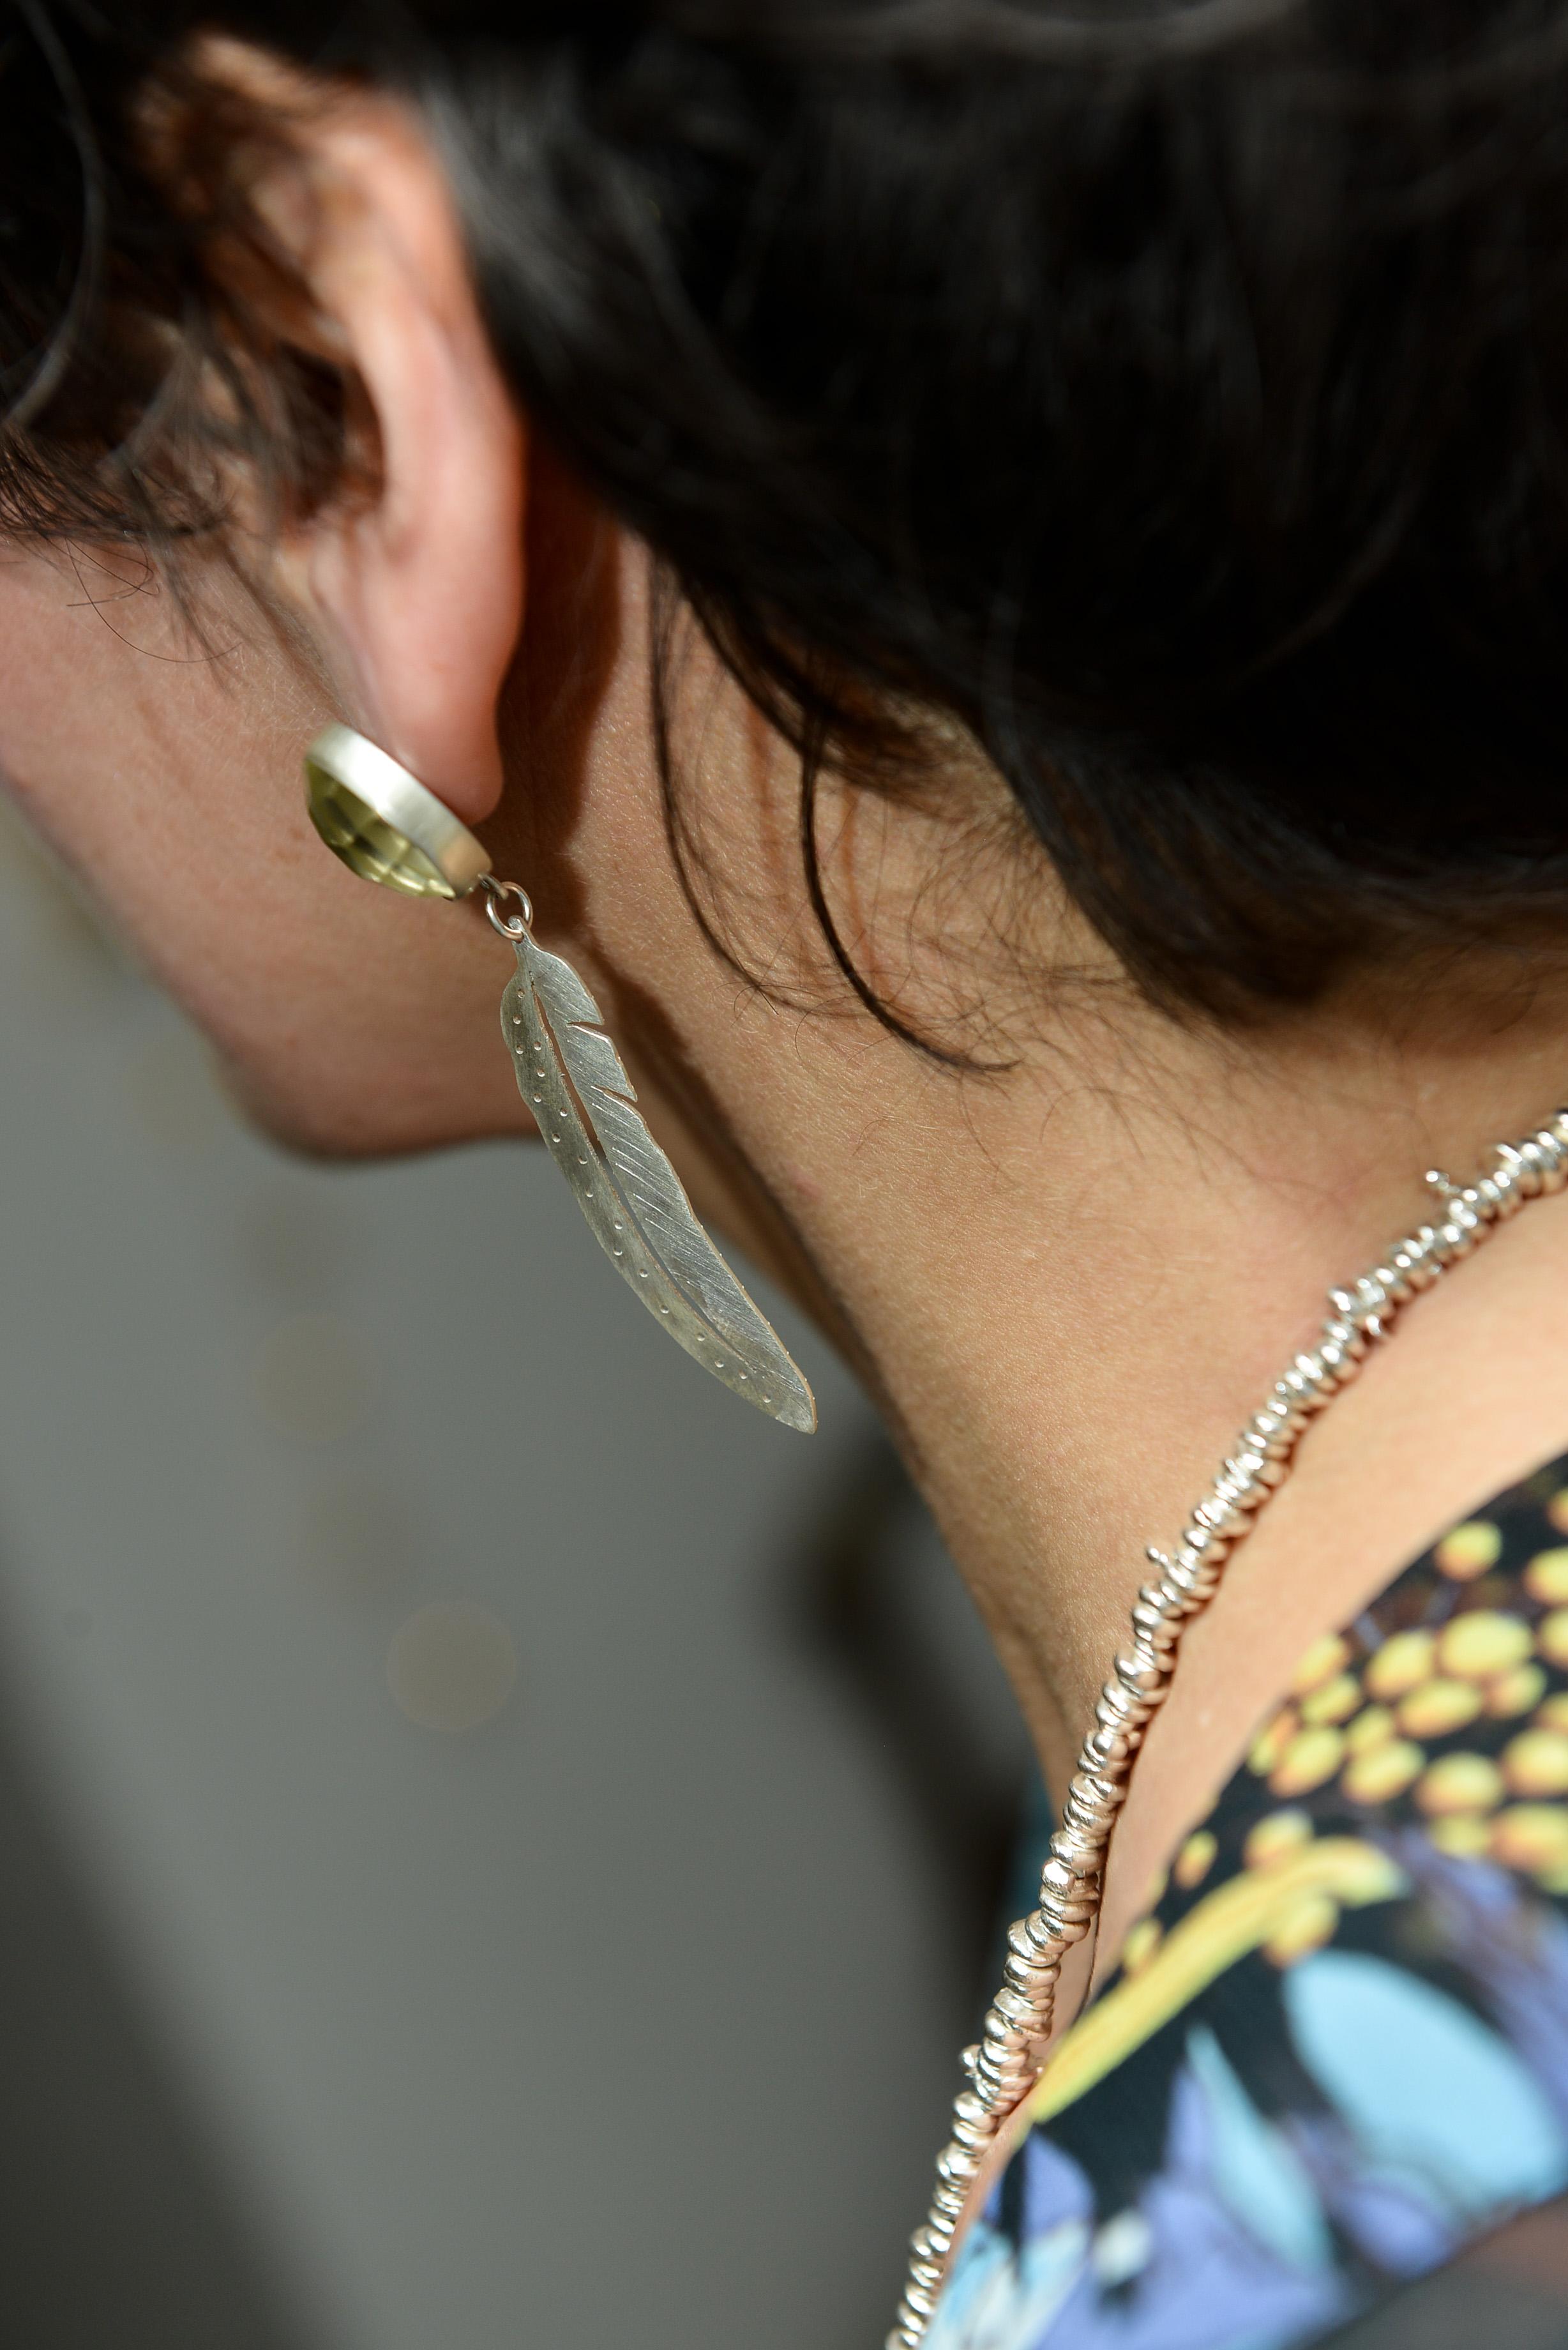 Feather earrings with lemon quartz